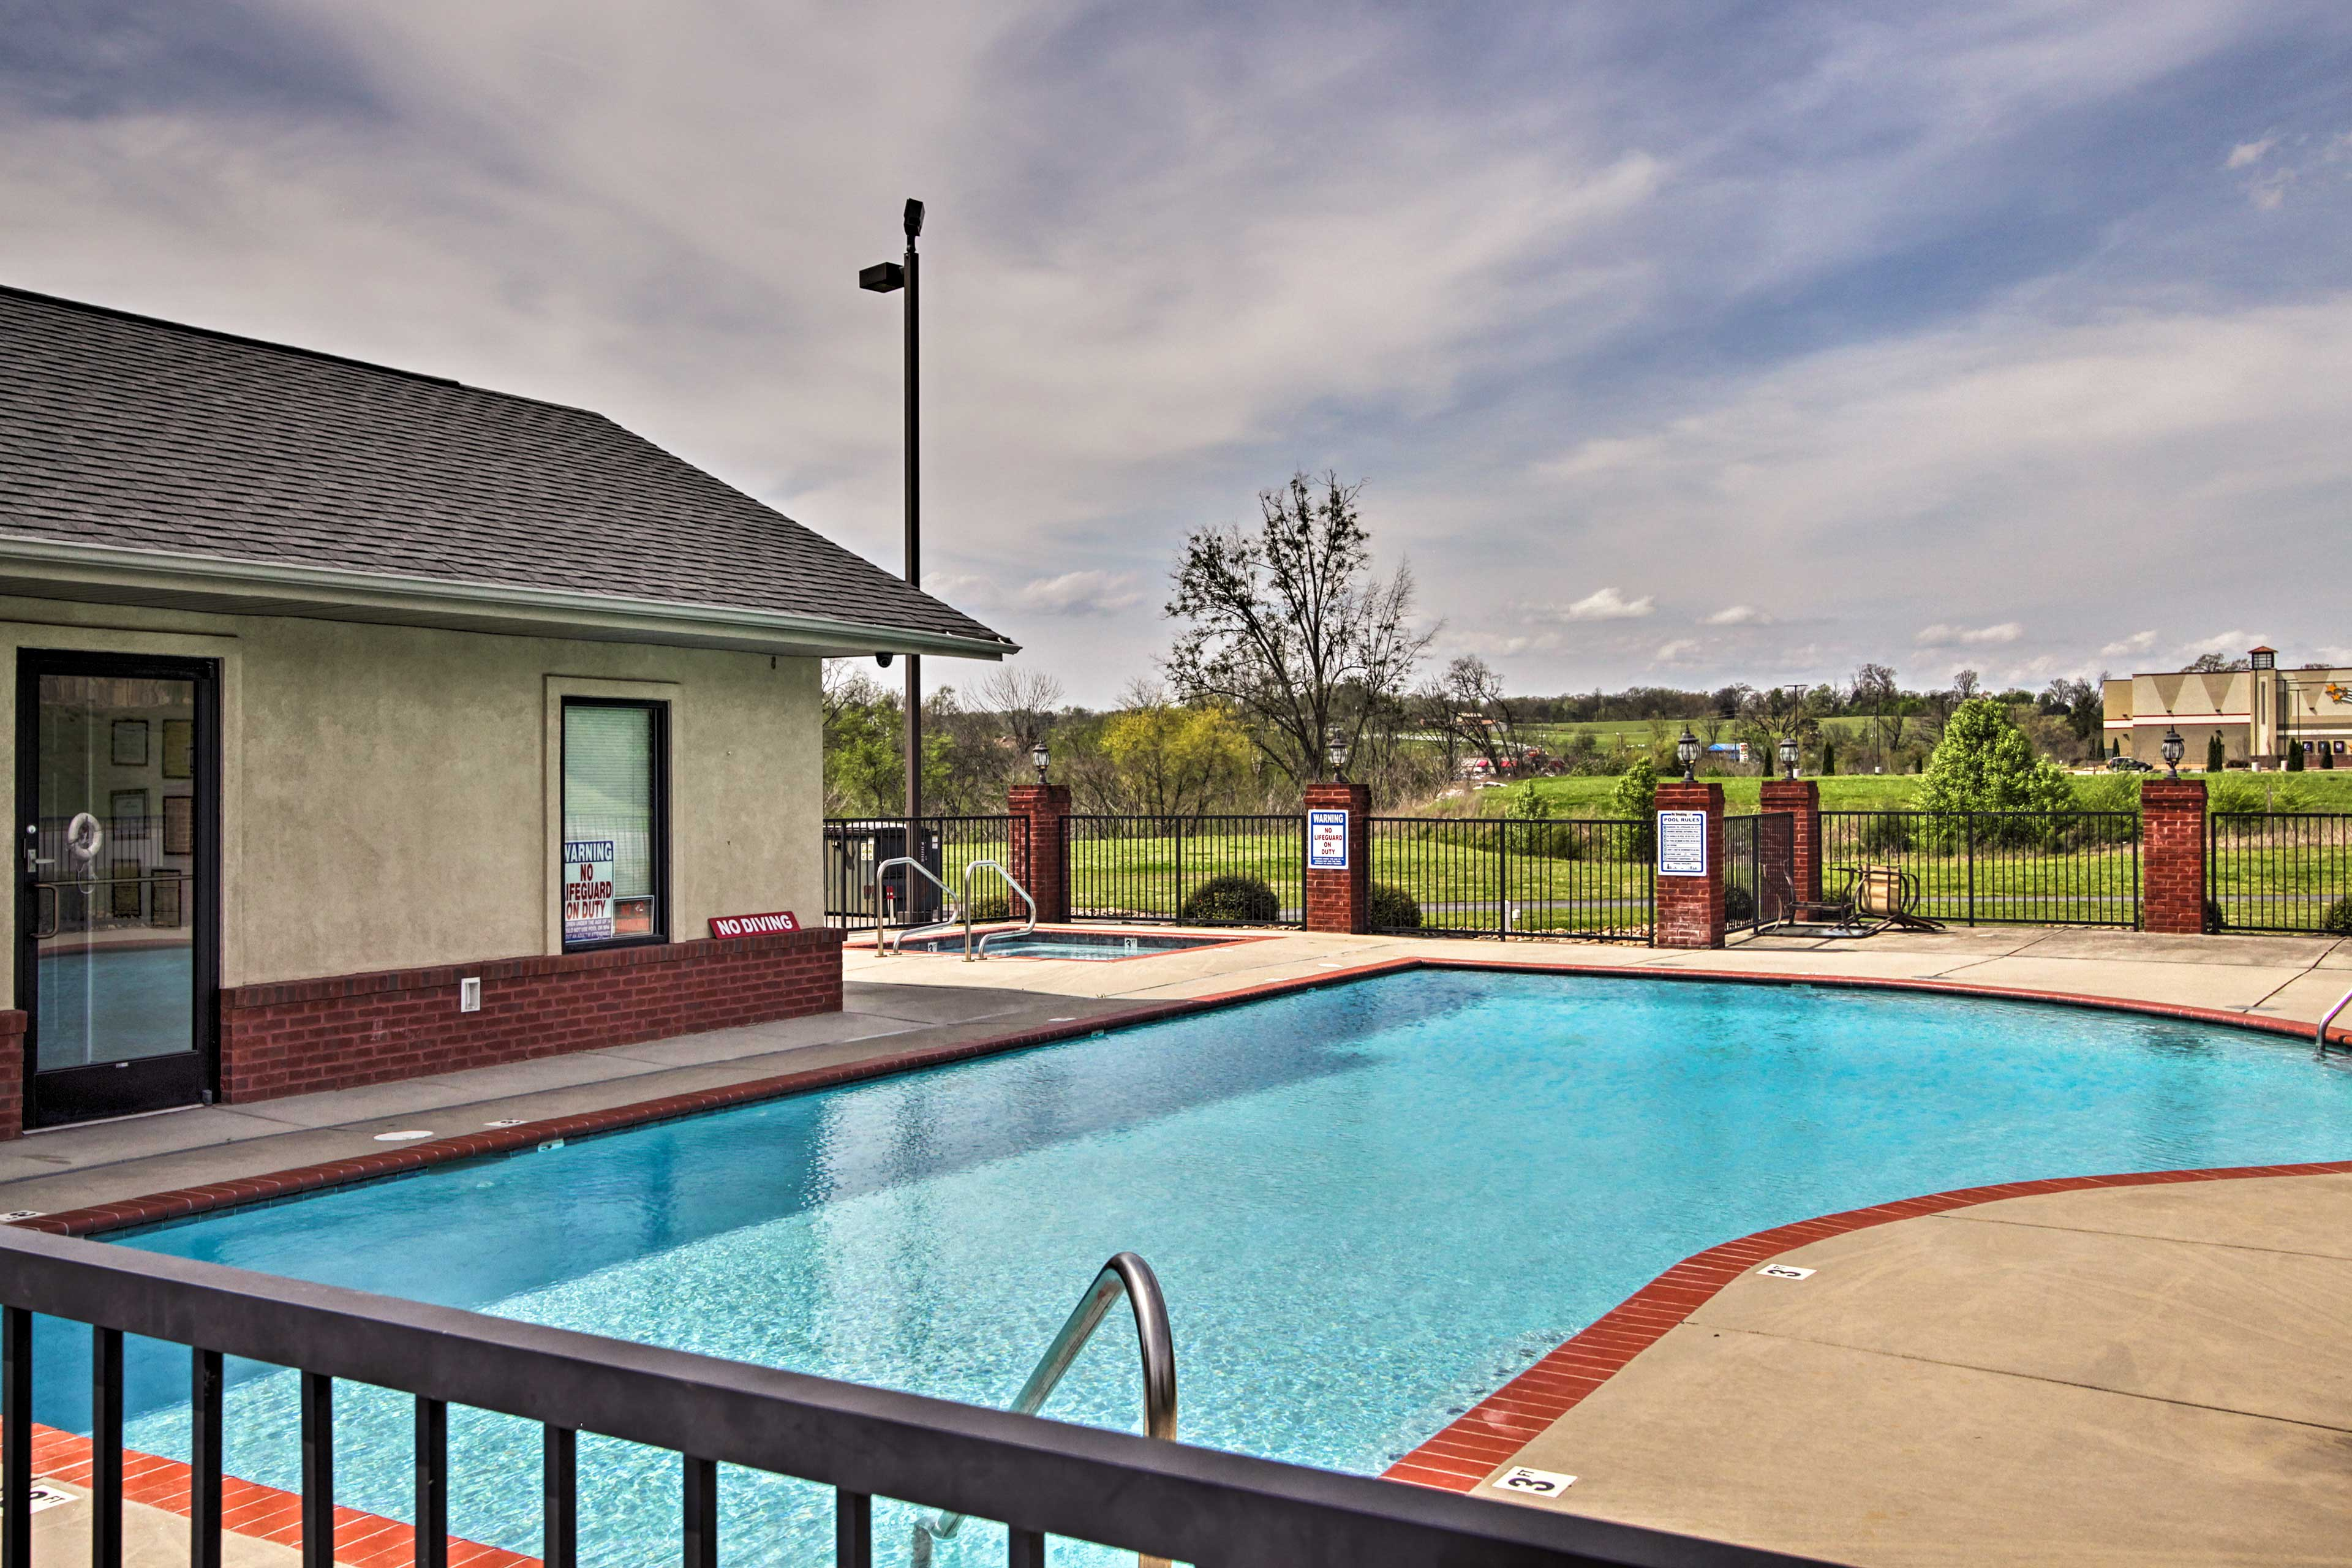 Community Amenities | Pool | Hot Tub | Open May - September